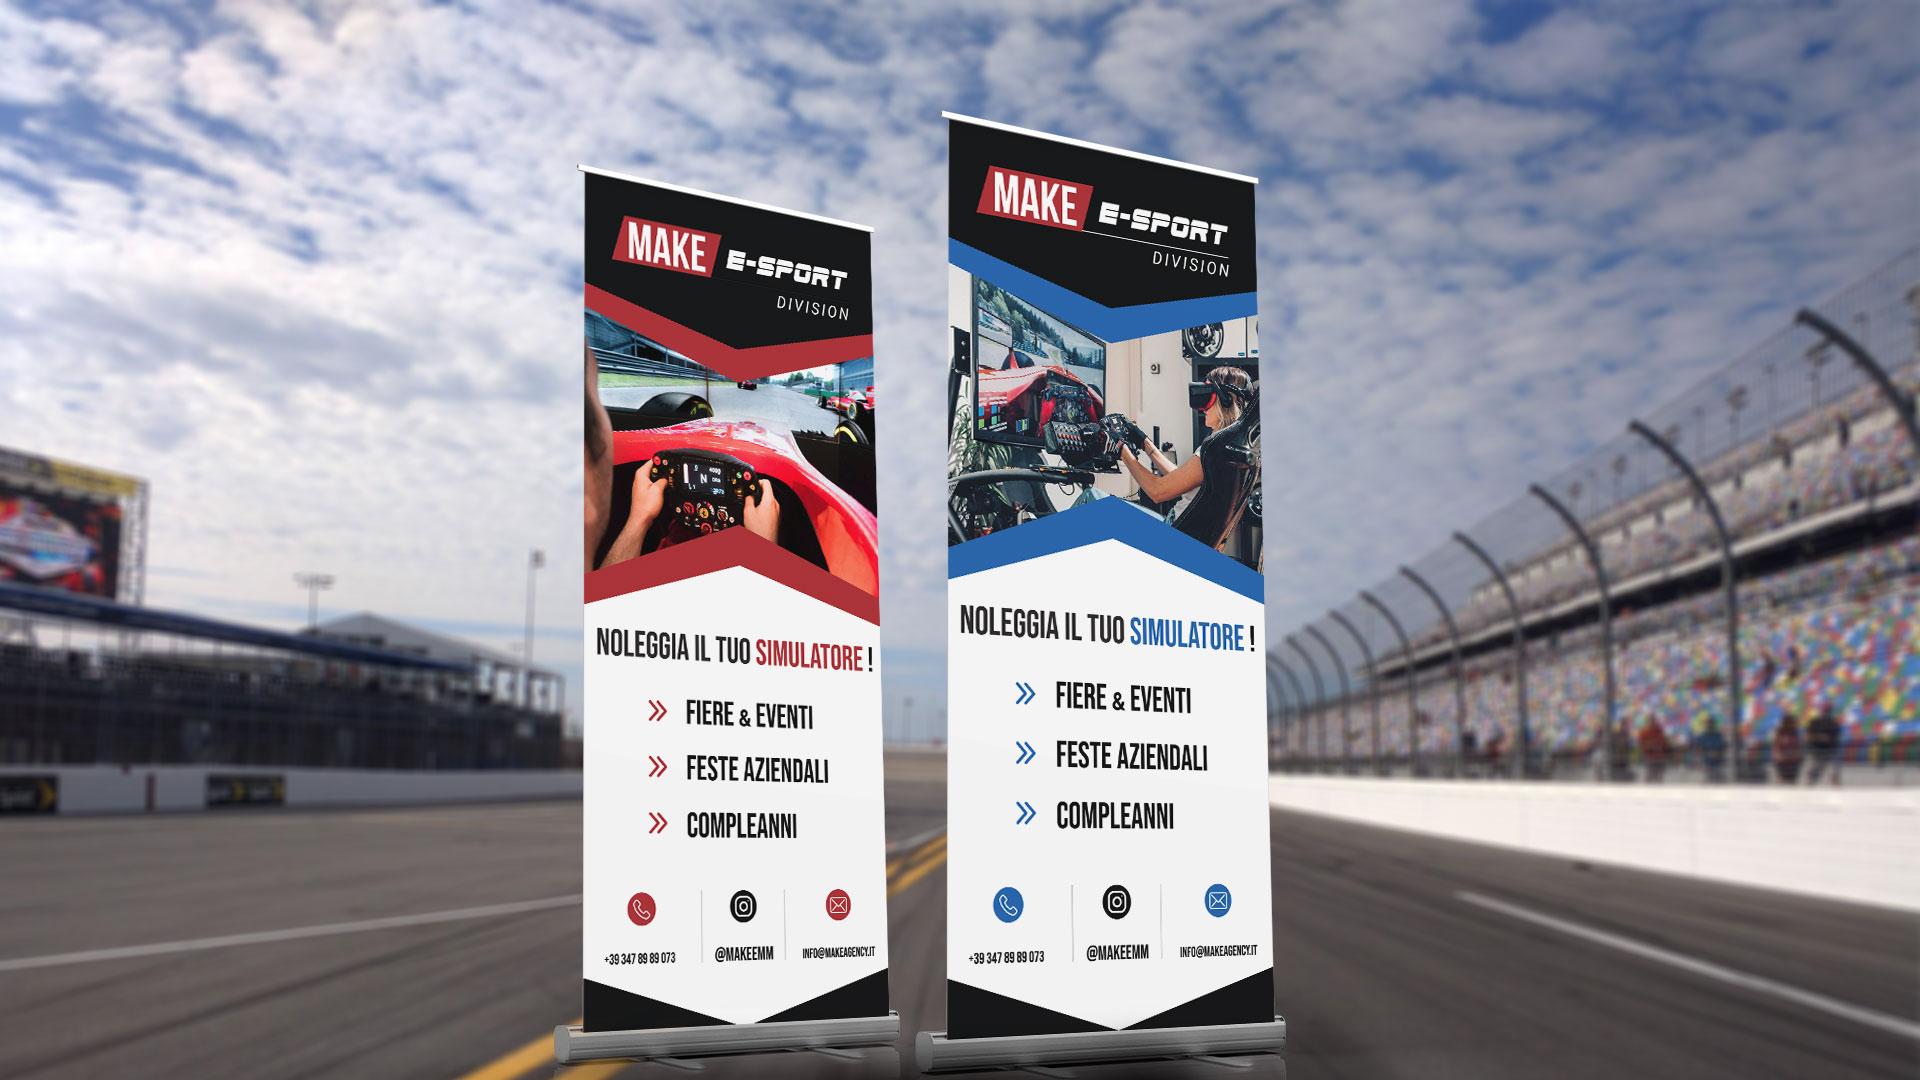 makeagency-grafica-rolupmakeesportsdivision